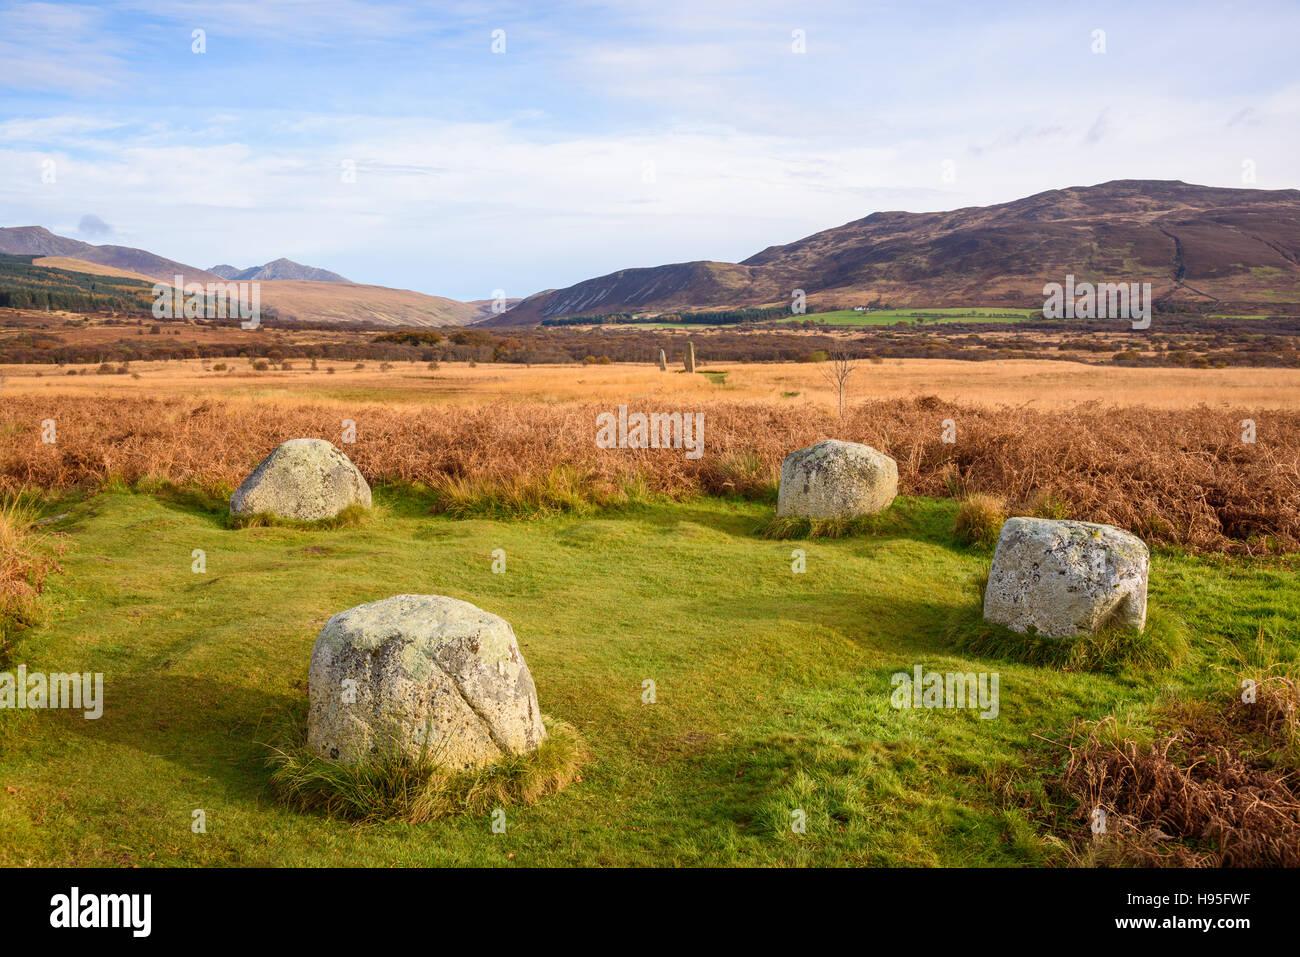 Machrie Moor lit à baldaquin, cercles de pierres, Isle of Arran, North Ayrshire, Ecosse Photo Stock